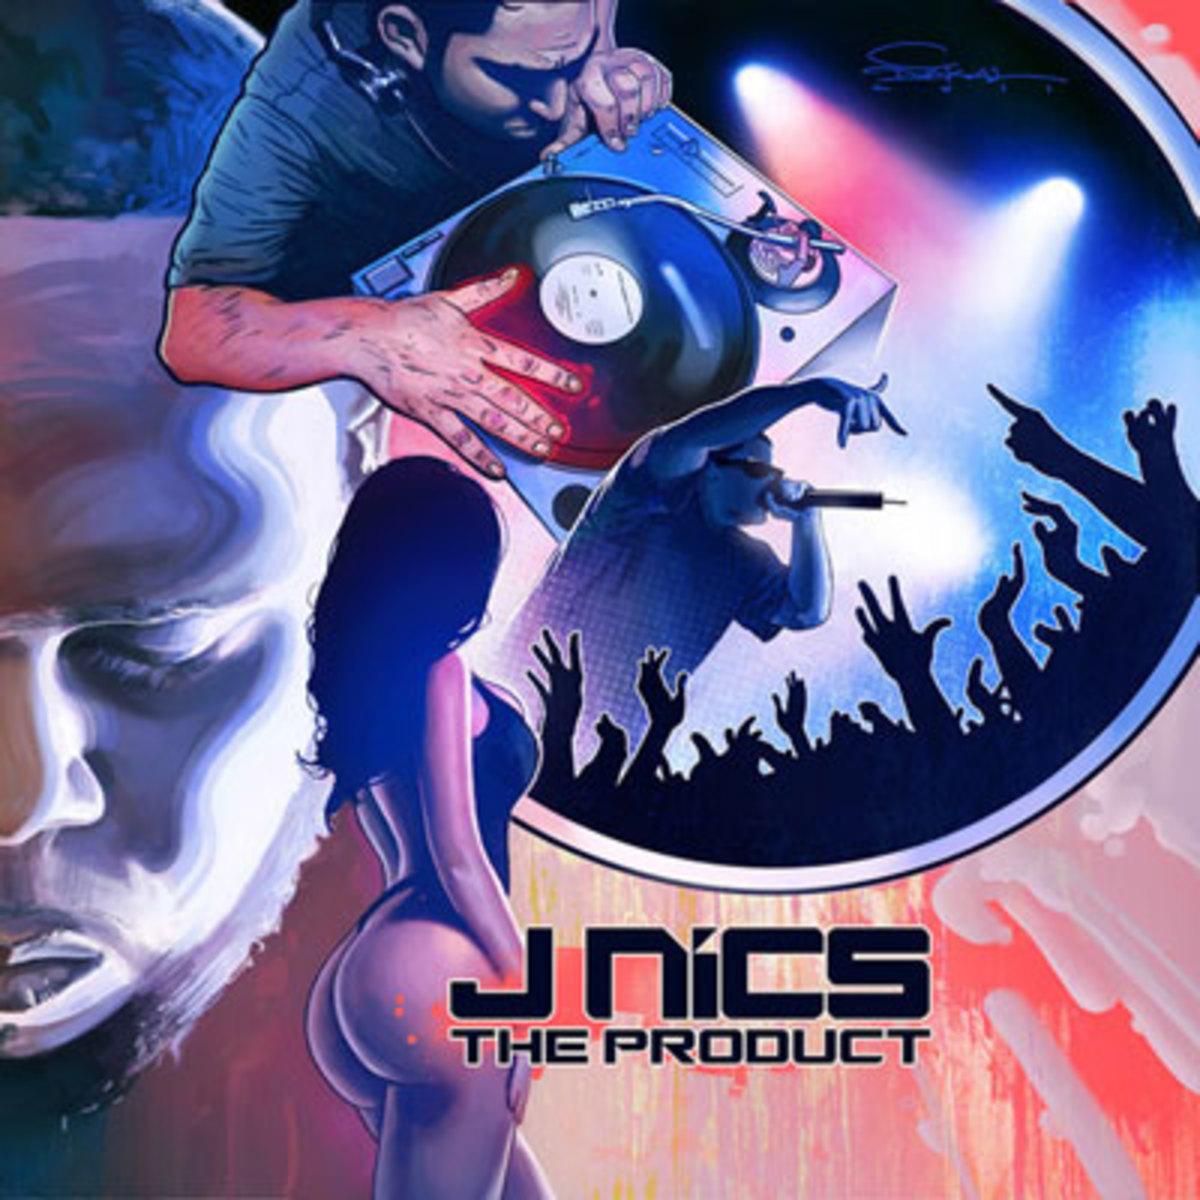 jnics-theproduct.jpg